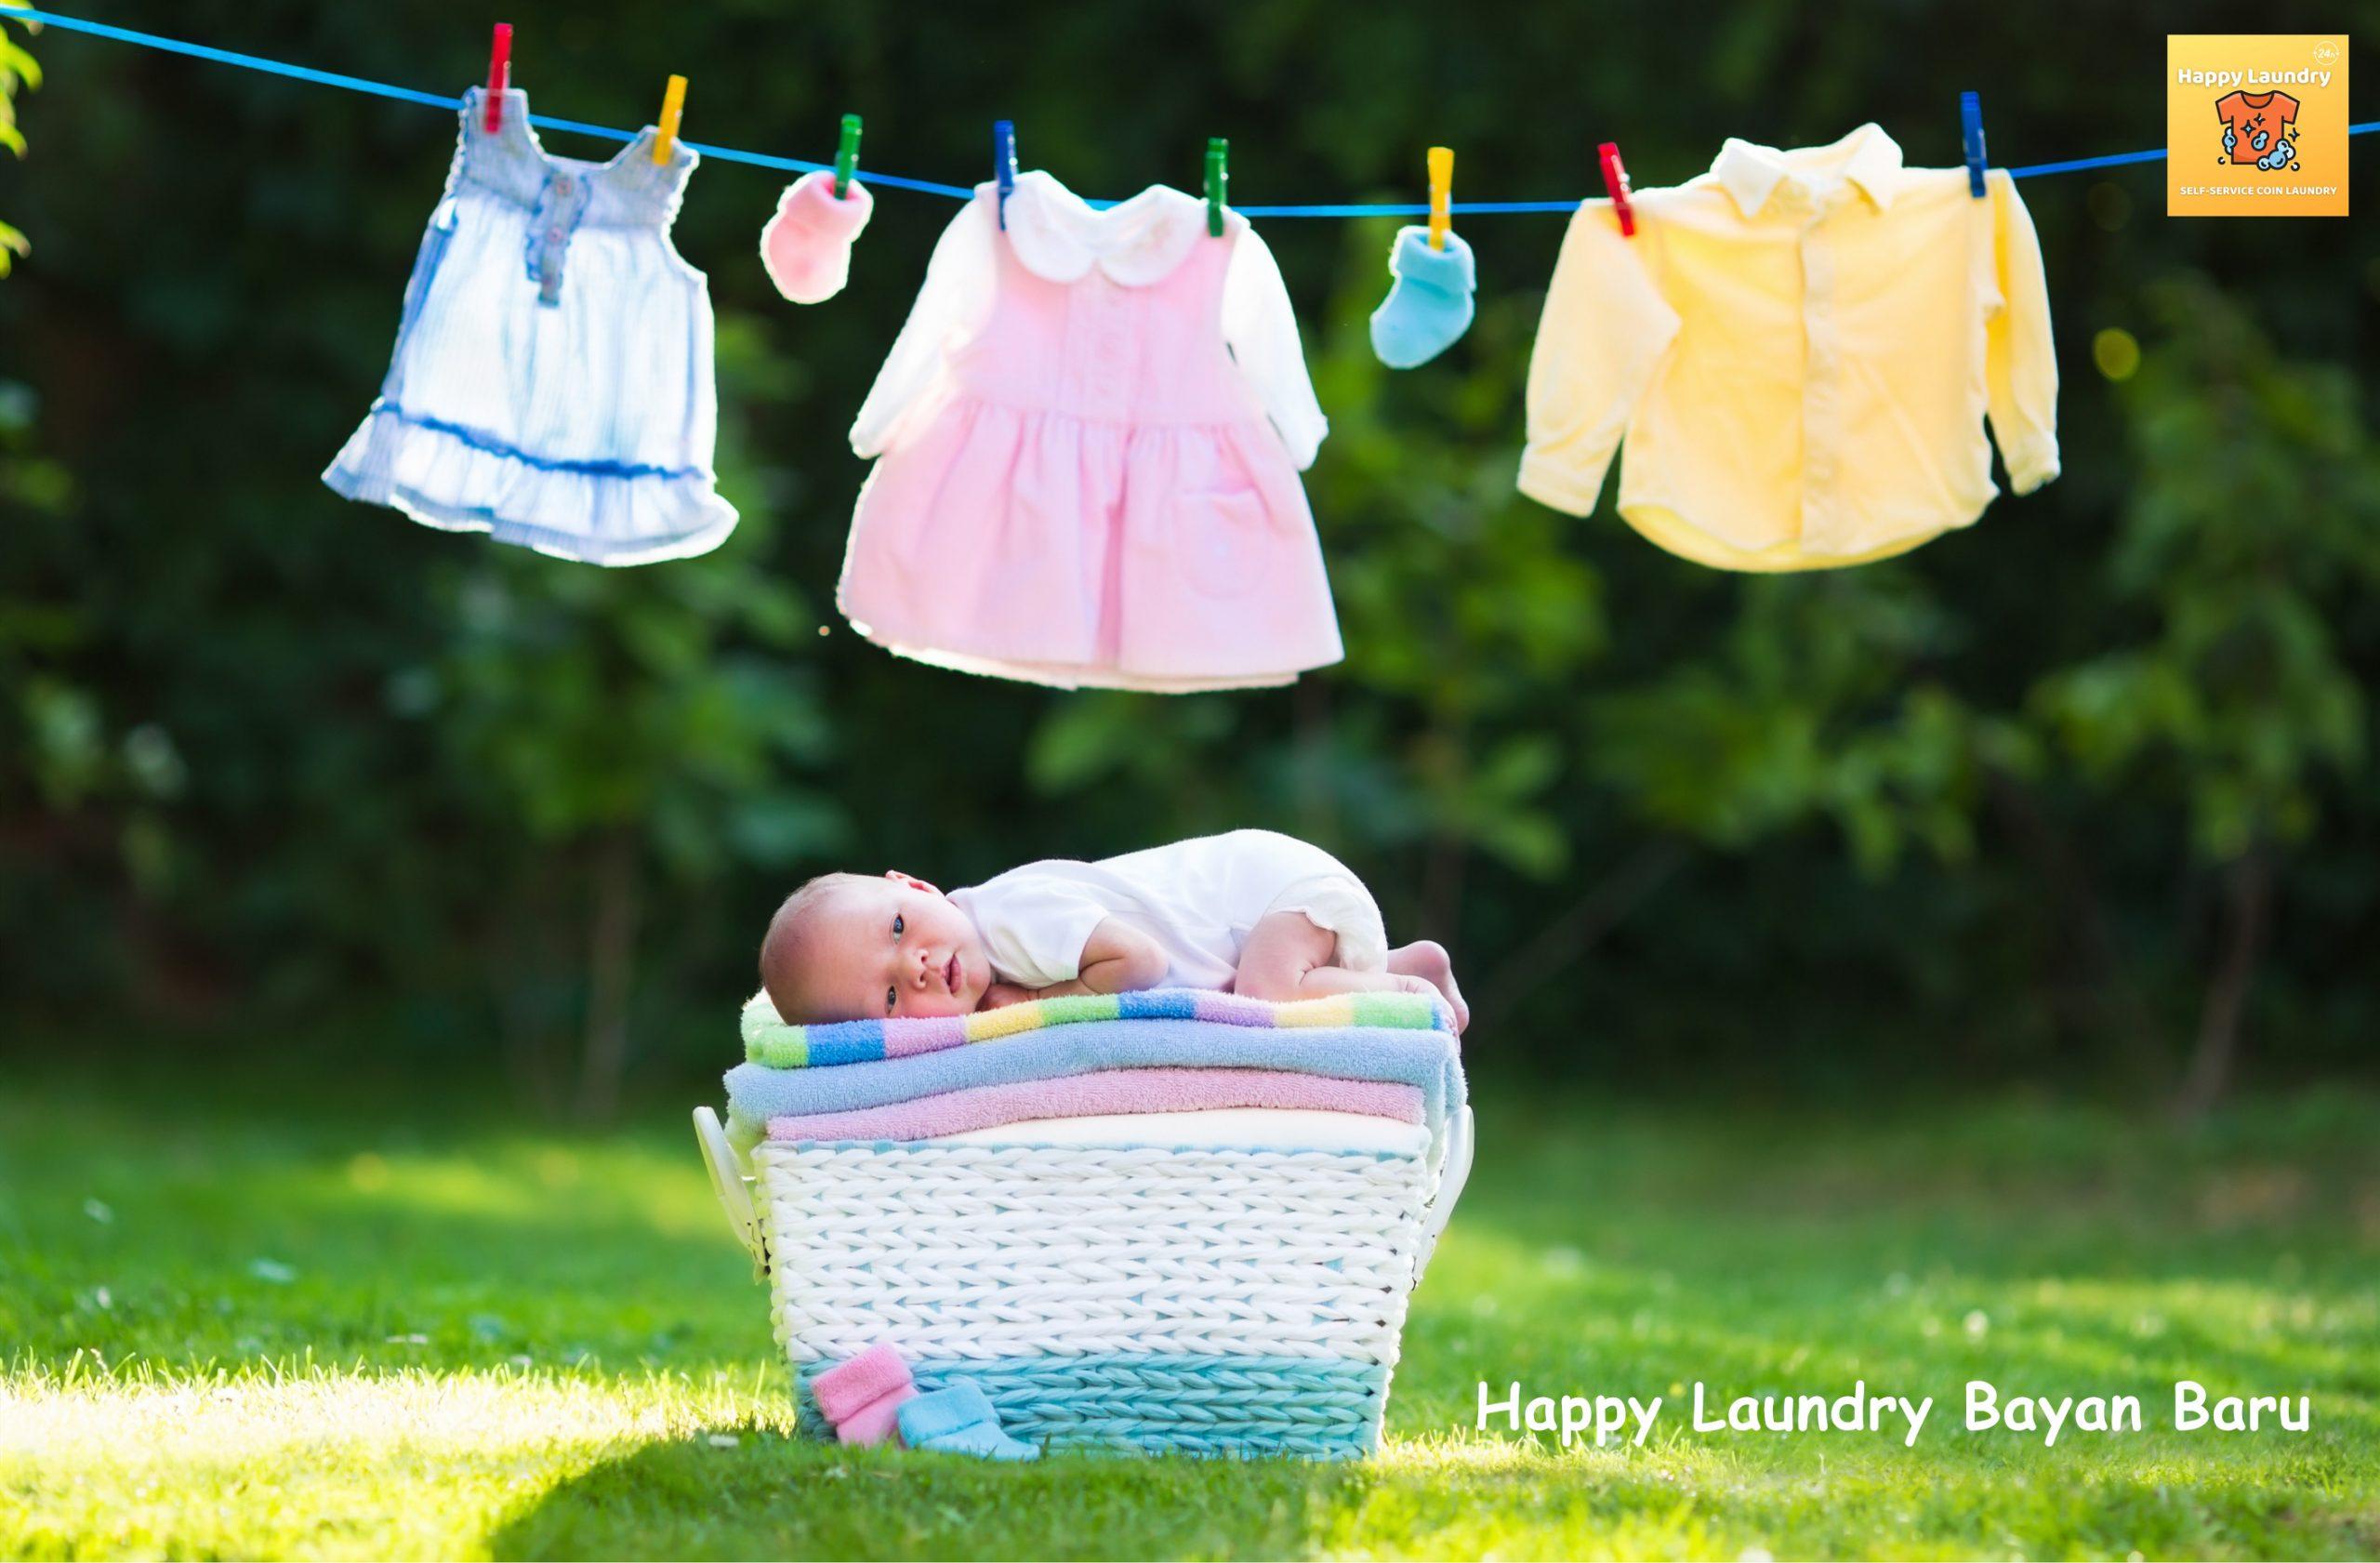 happy laundry bayan baru